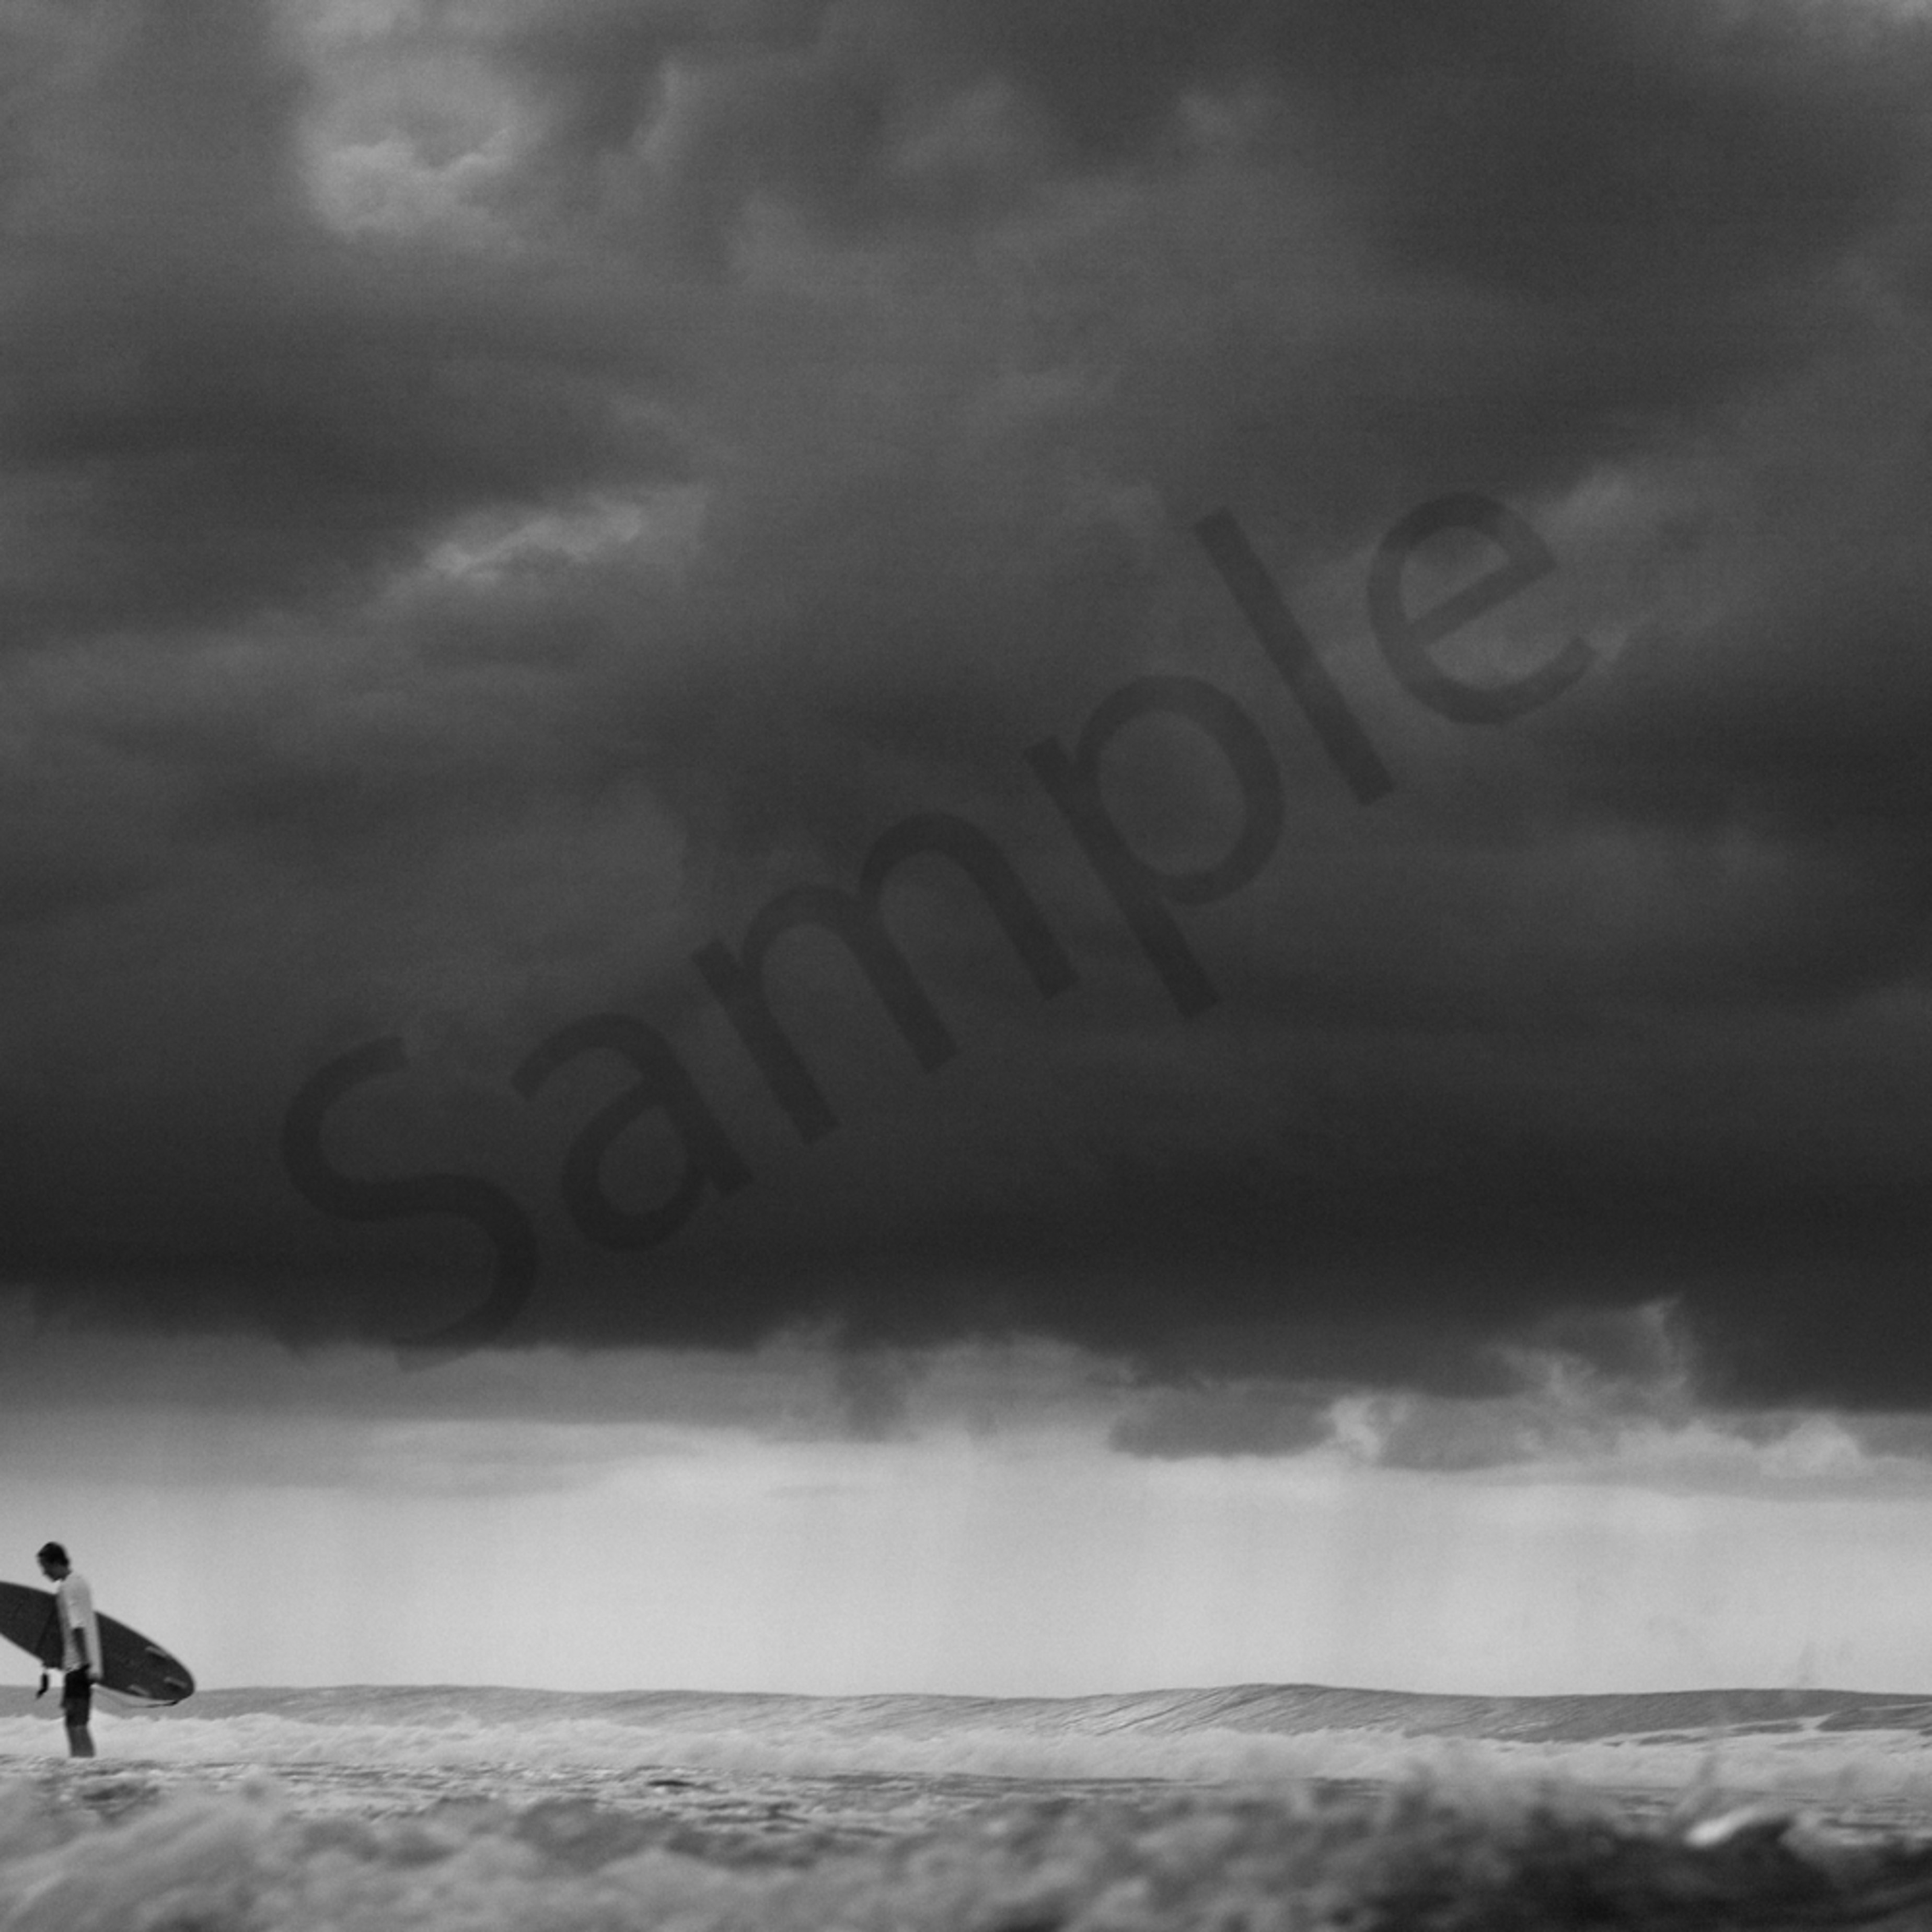 Surfer 1 2 zrfxmh